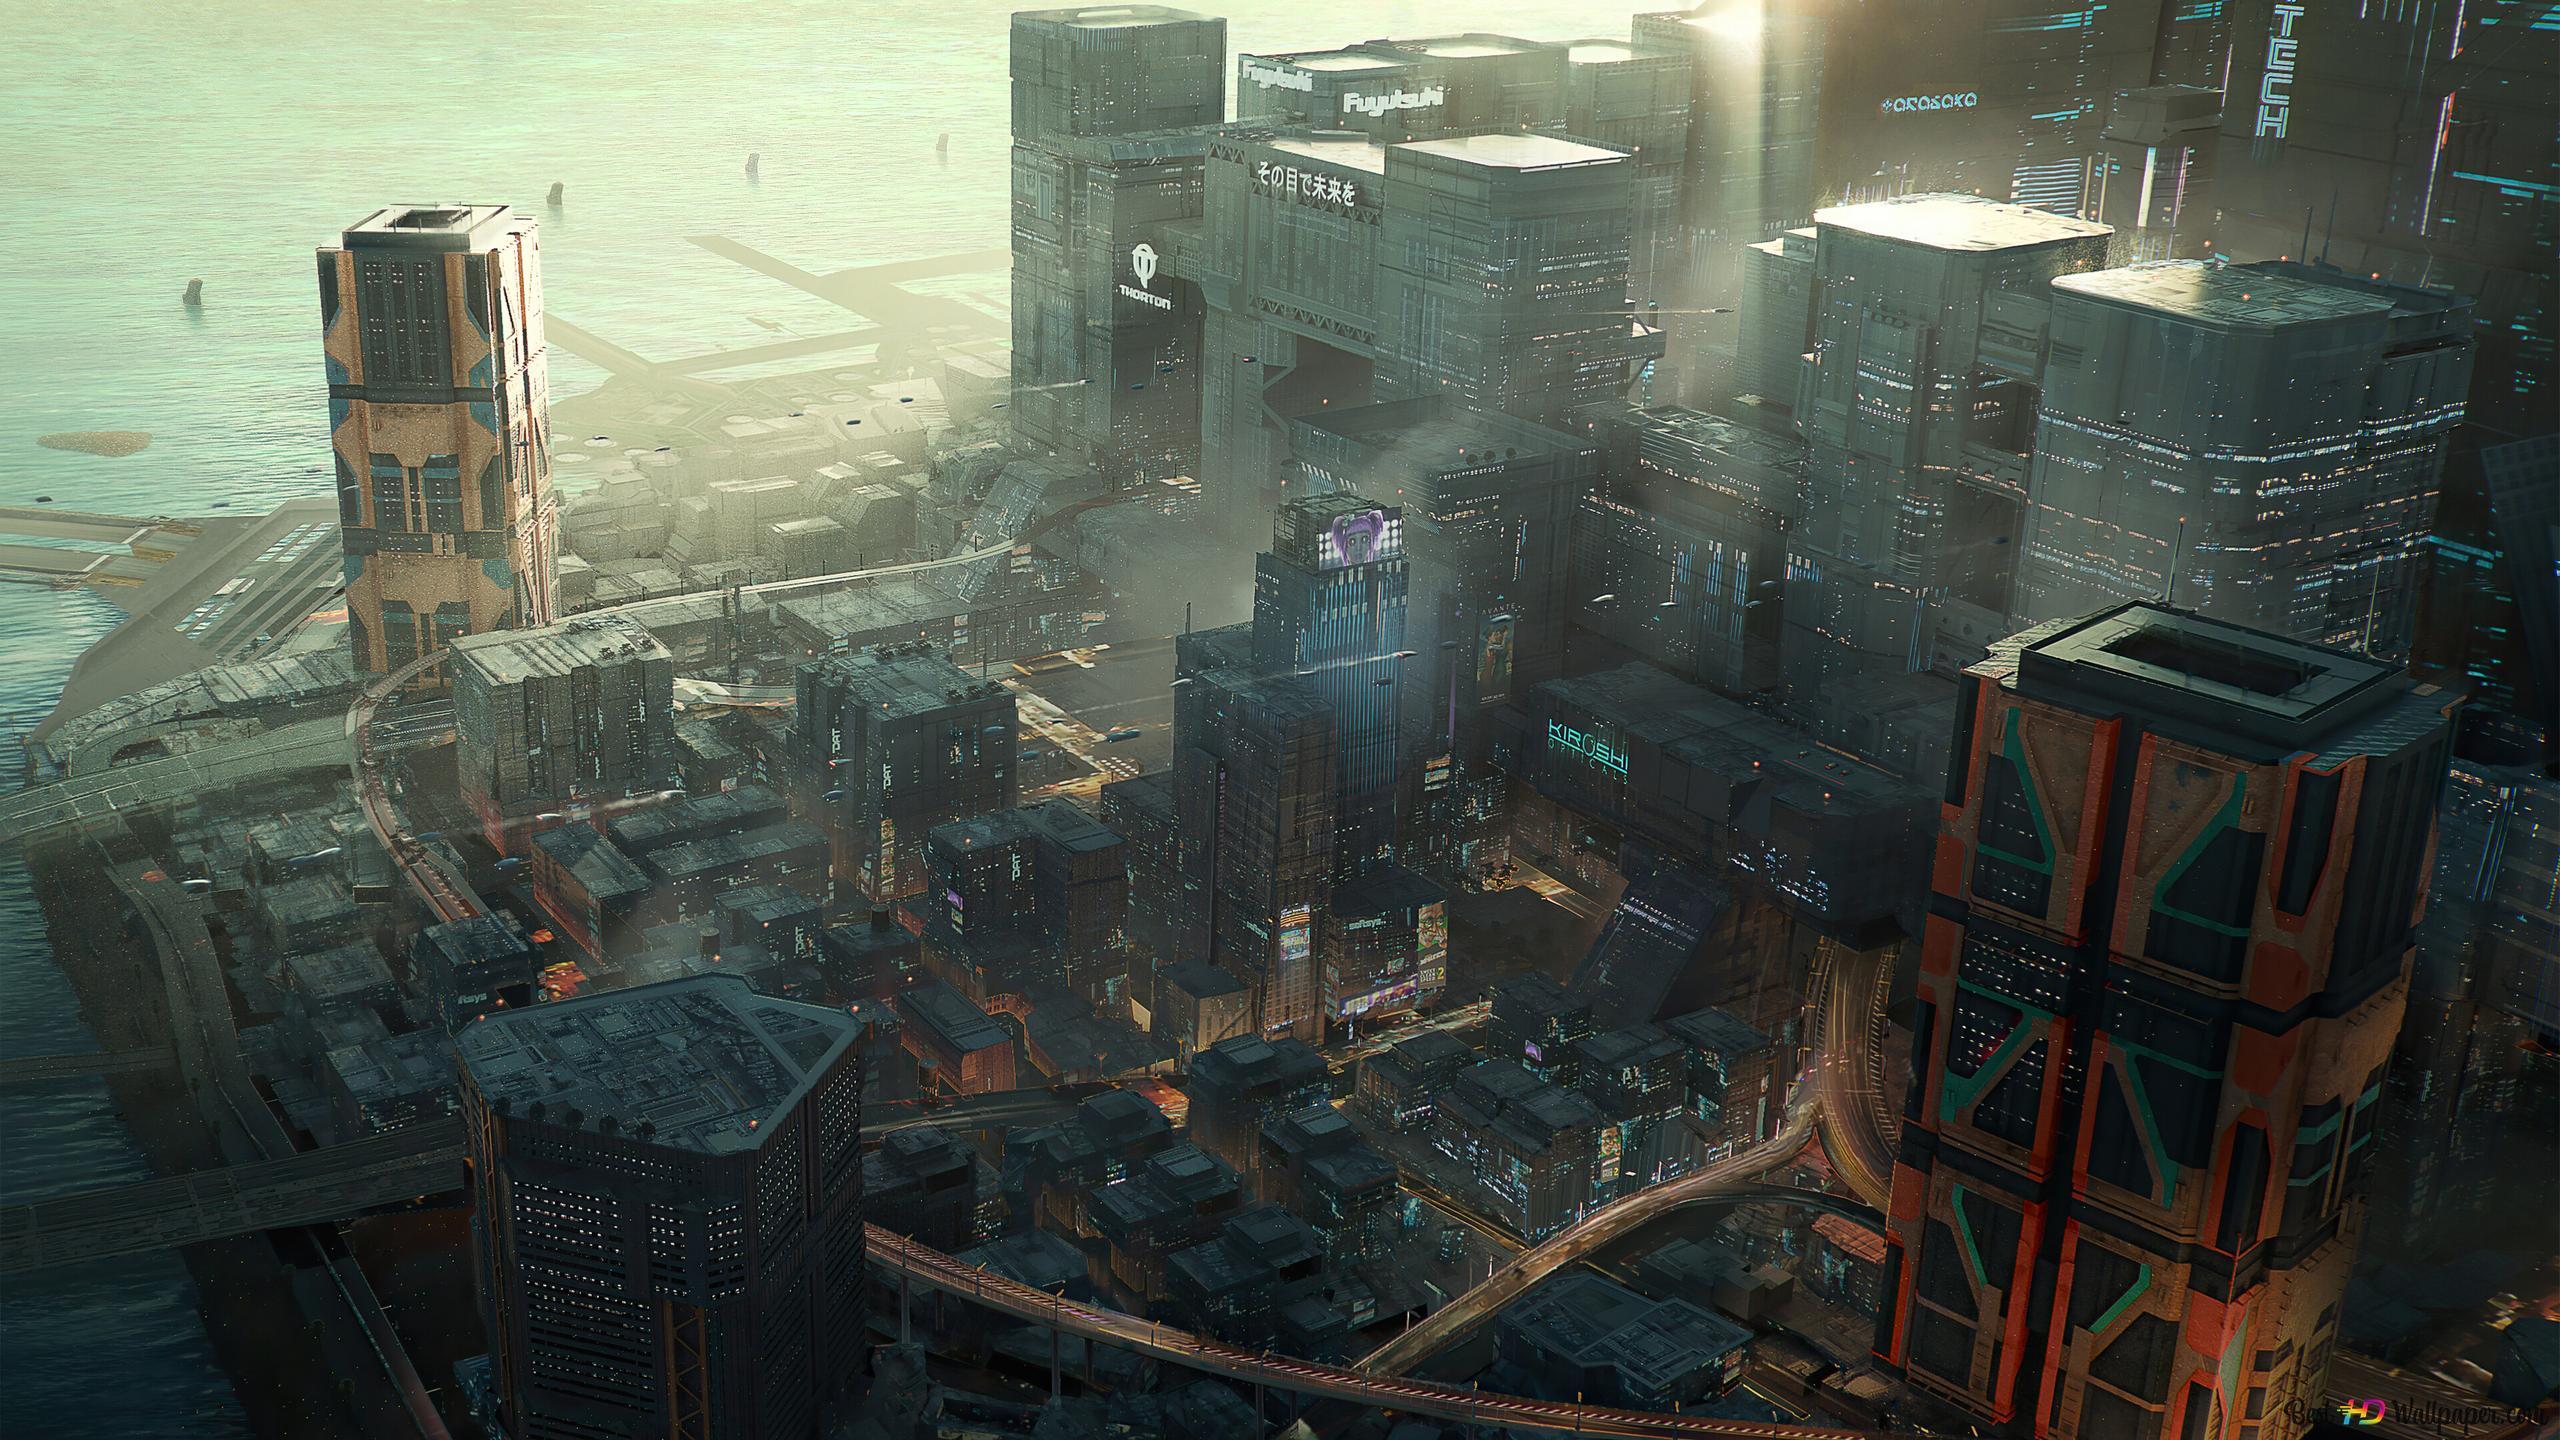 Cyberpunk 2077 Video Game Night City Concept Art Hd Wallpaper Download